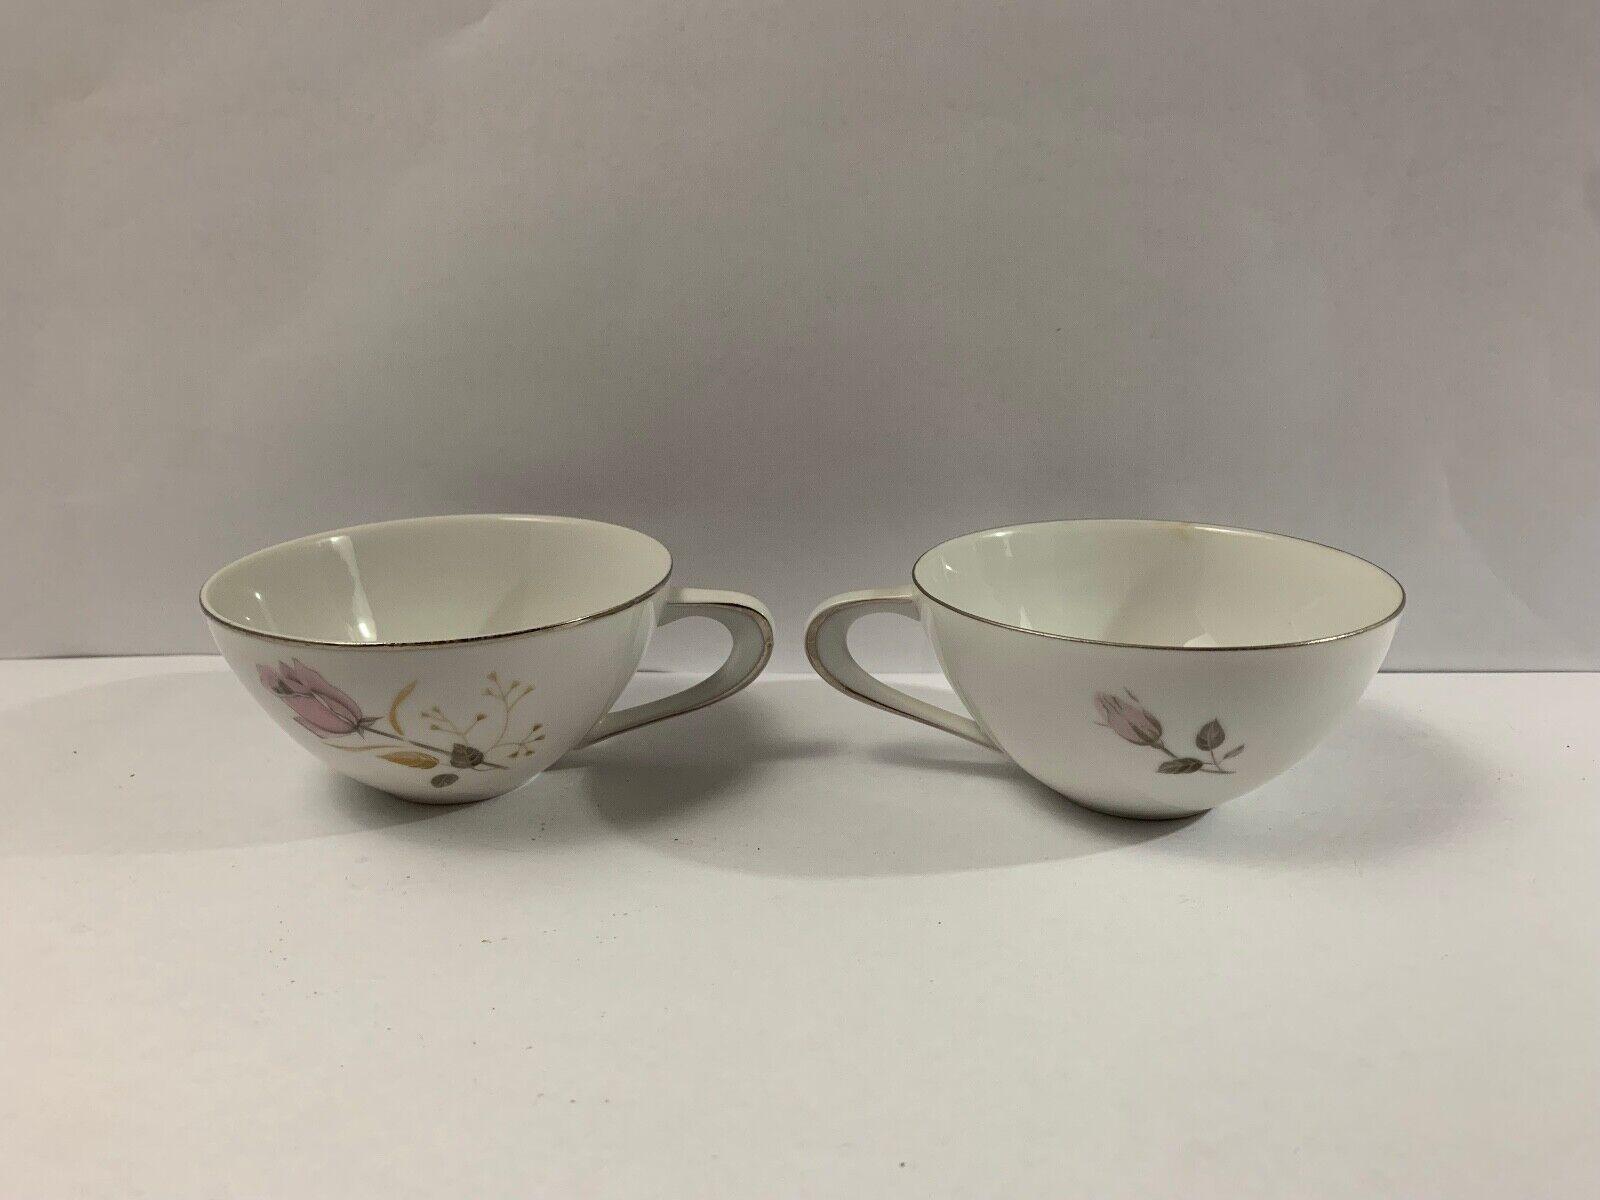 "Tea // Coffee Cup 4 1//4/"" Dia. ALSACE #3649 Sango Porcelain China Japan"